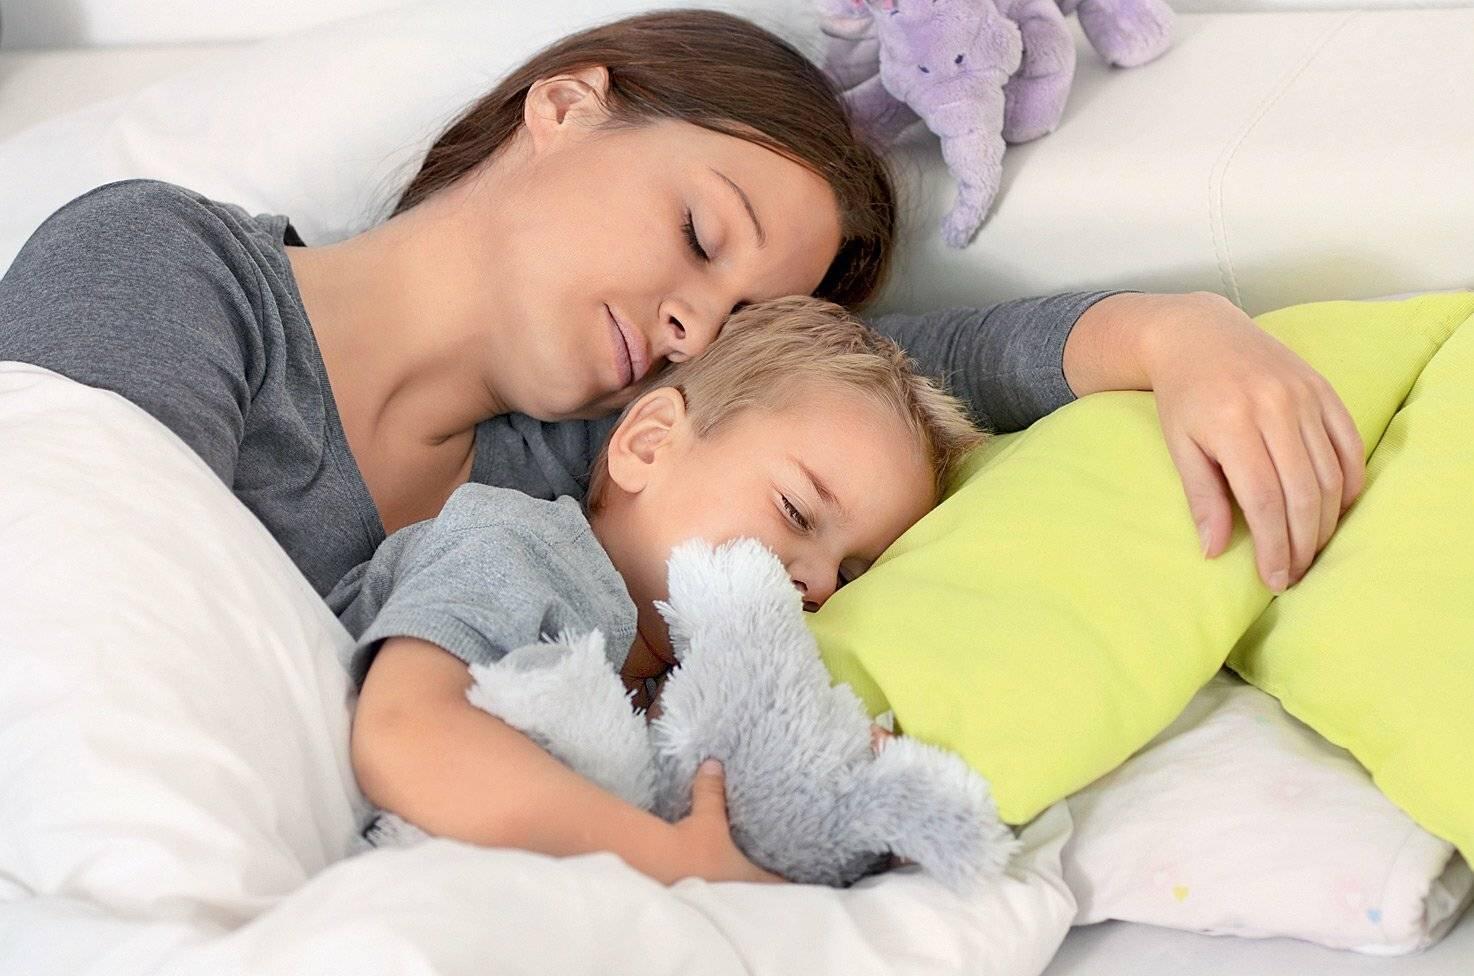 Совместный сон матери и ребенка: польза или вред?